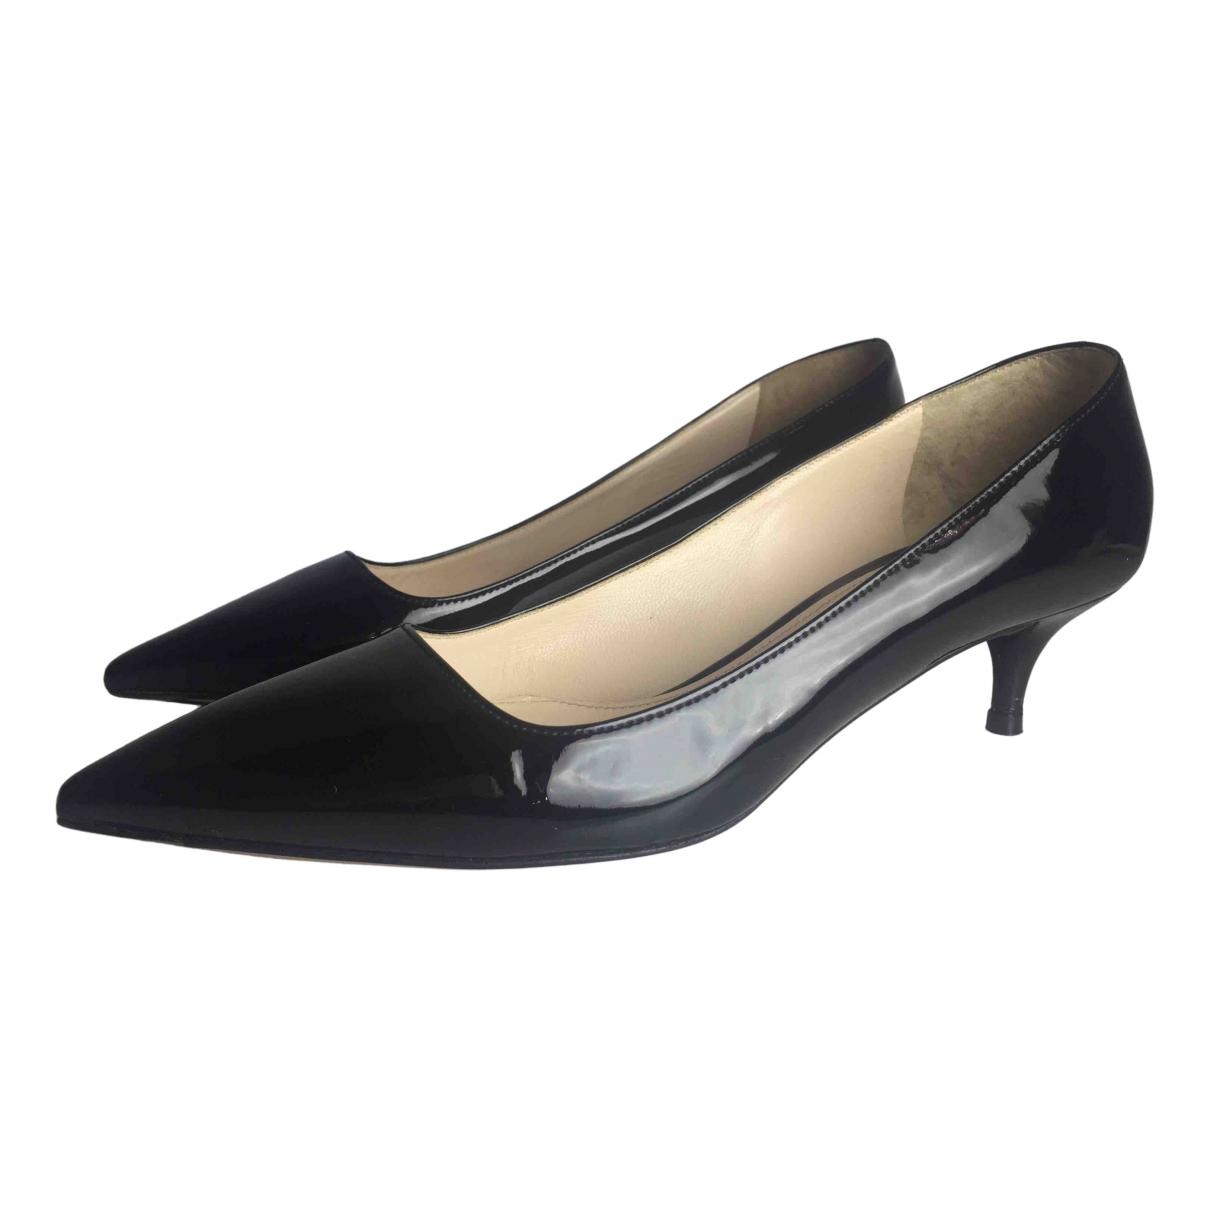 Prada Mary Jane Black Patent leather Heels for Women 37 EU